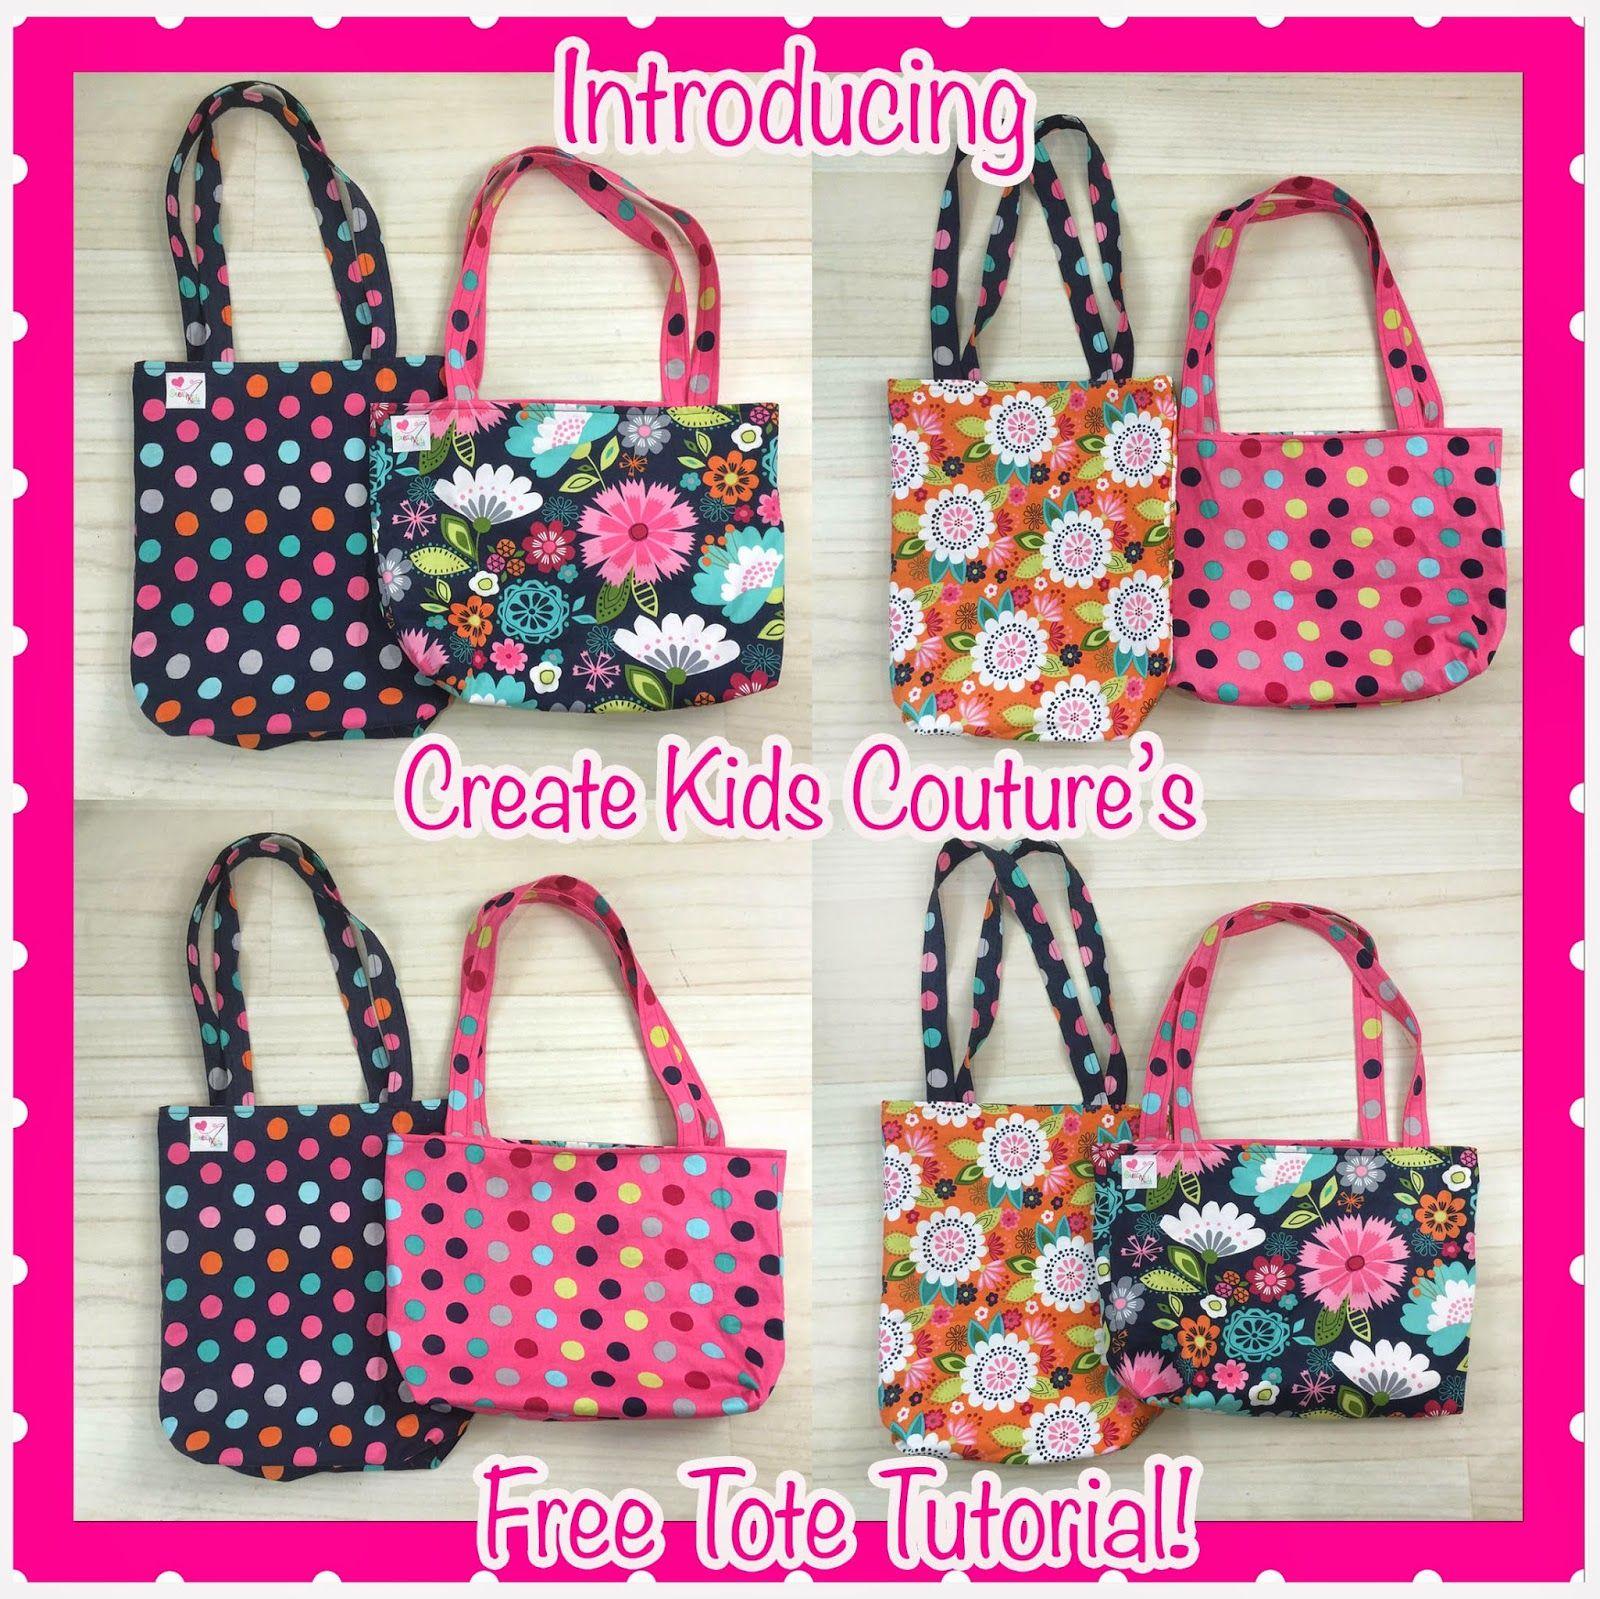 Free Tote Bag Tutorial! Easy to Sew! Tote bag pattern